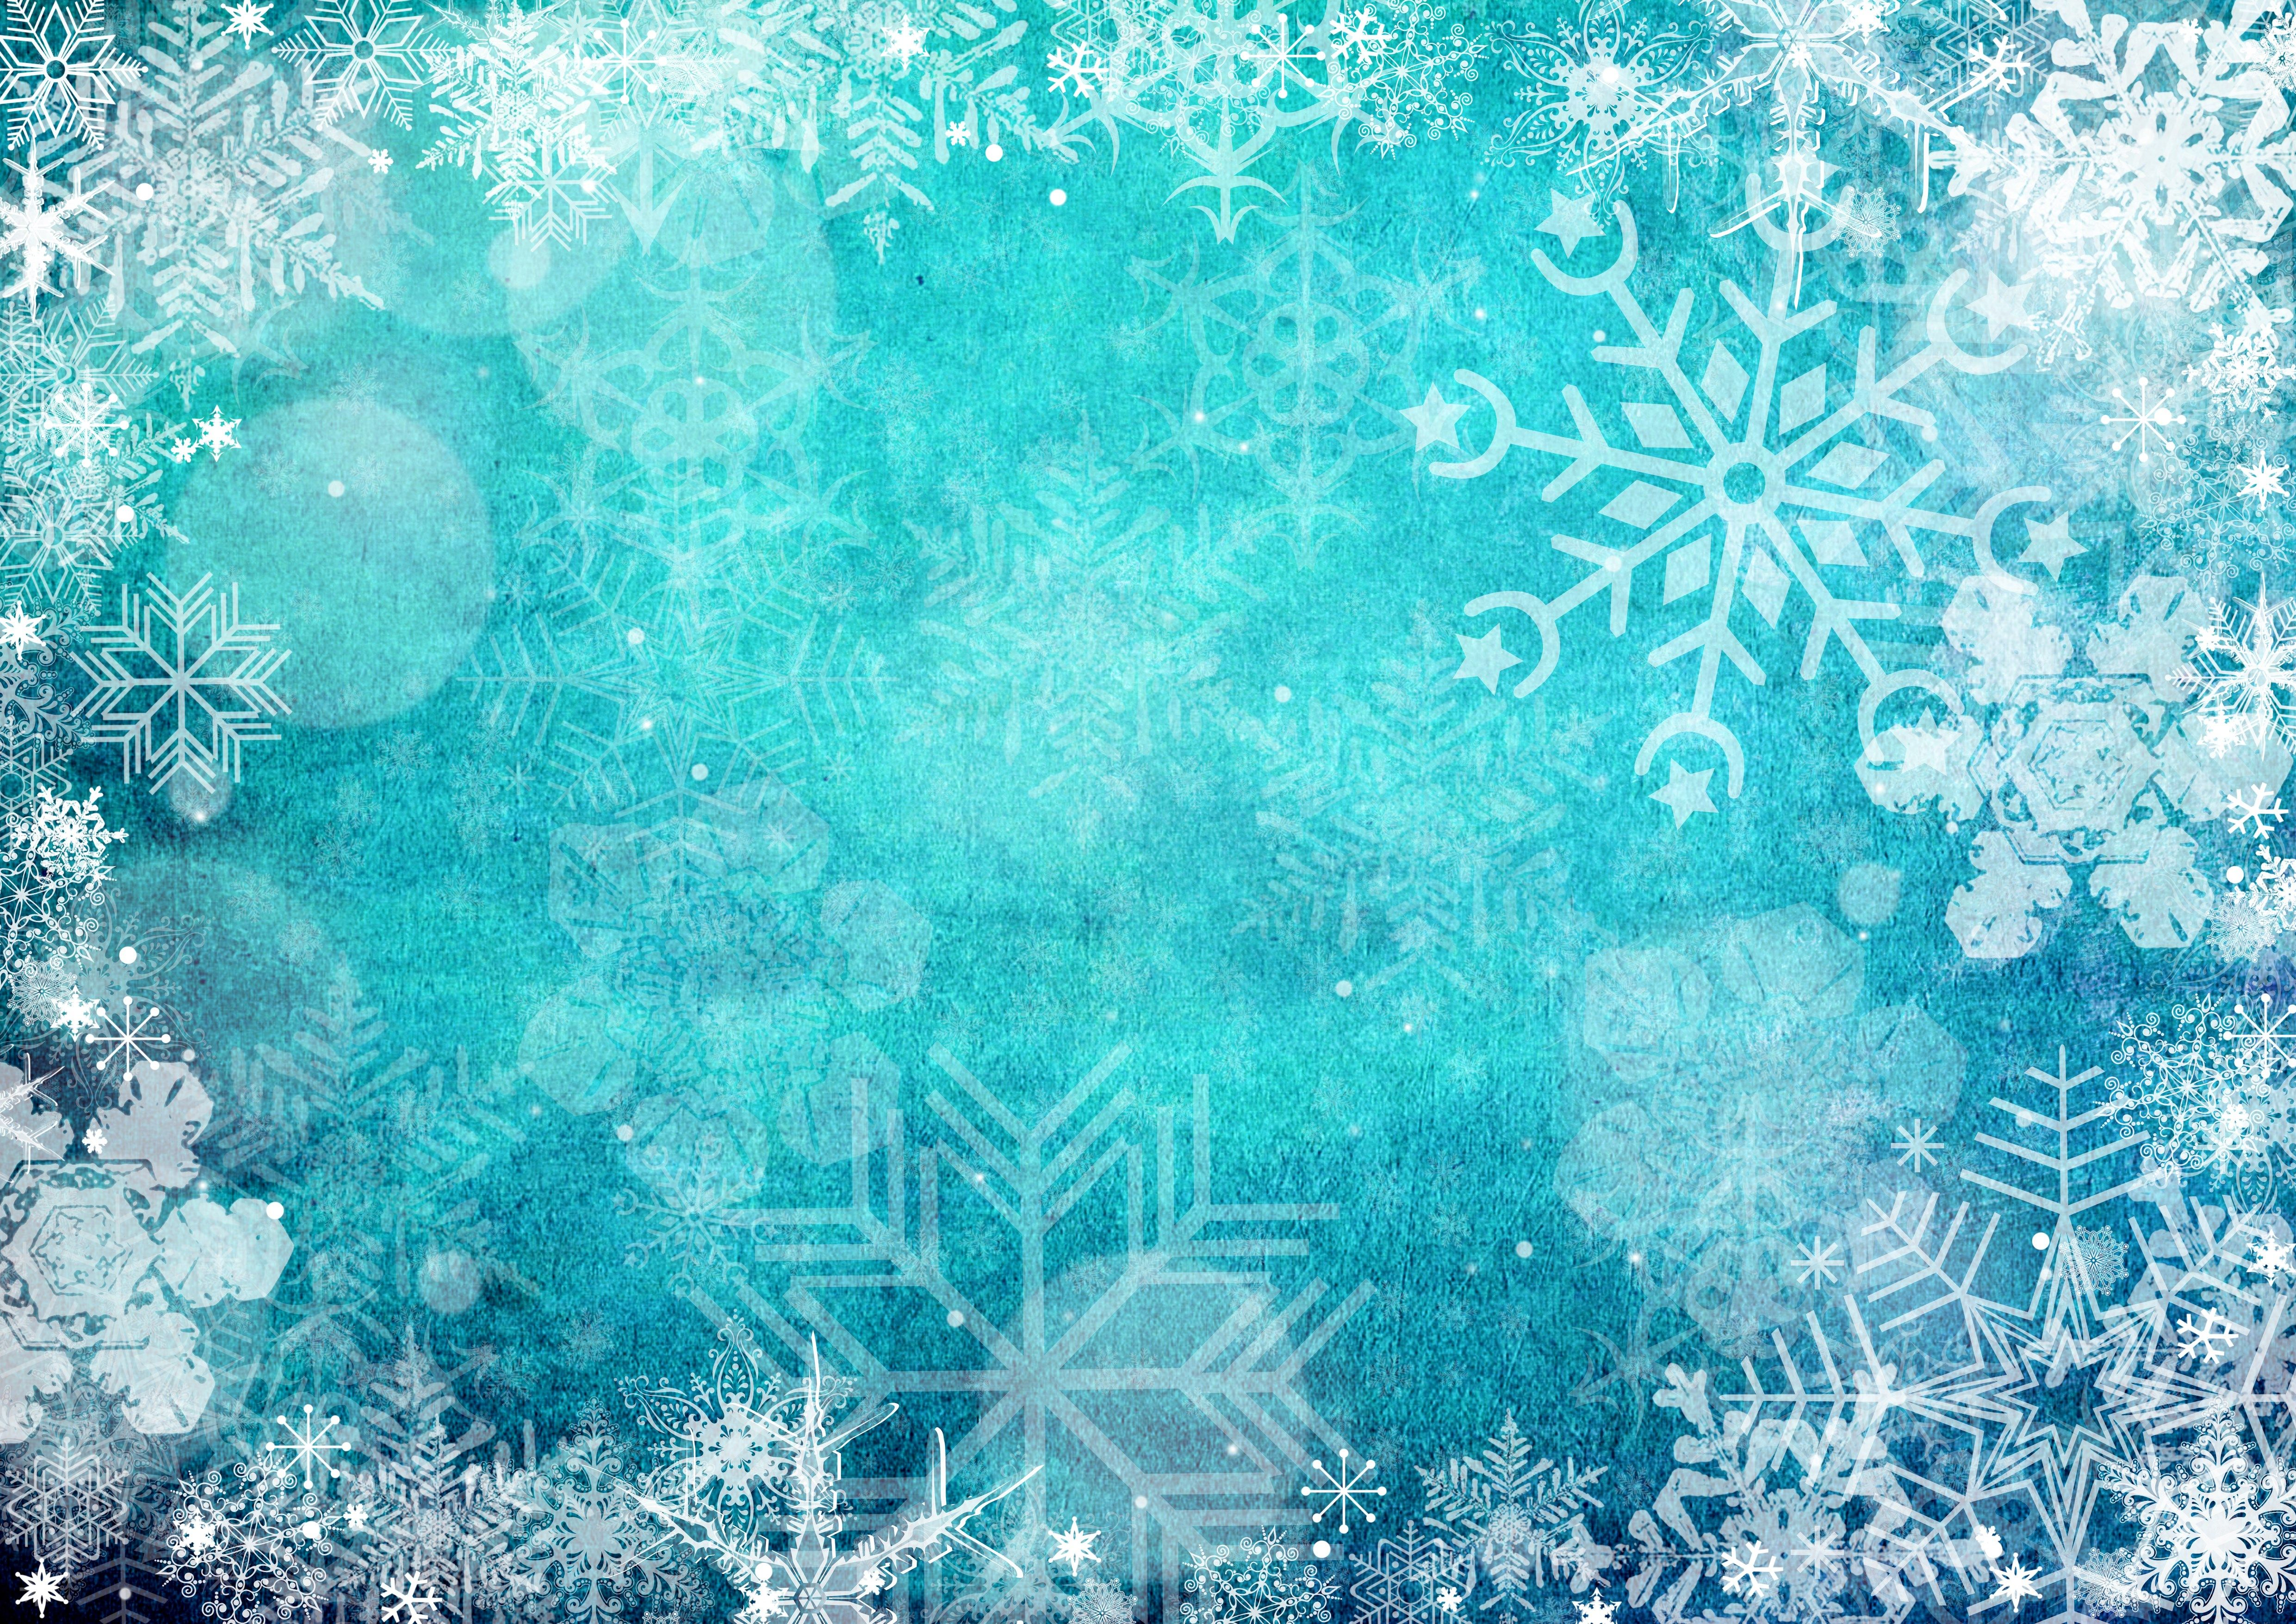 Snowflake desktop nexus wallpaper hueputalo pinterest windows snowflake desktop nexus wallpaper voltagebd Choice Image